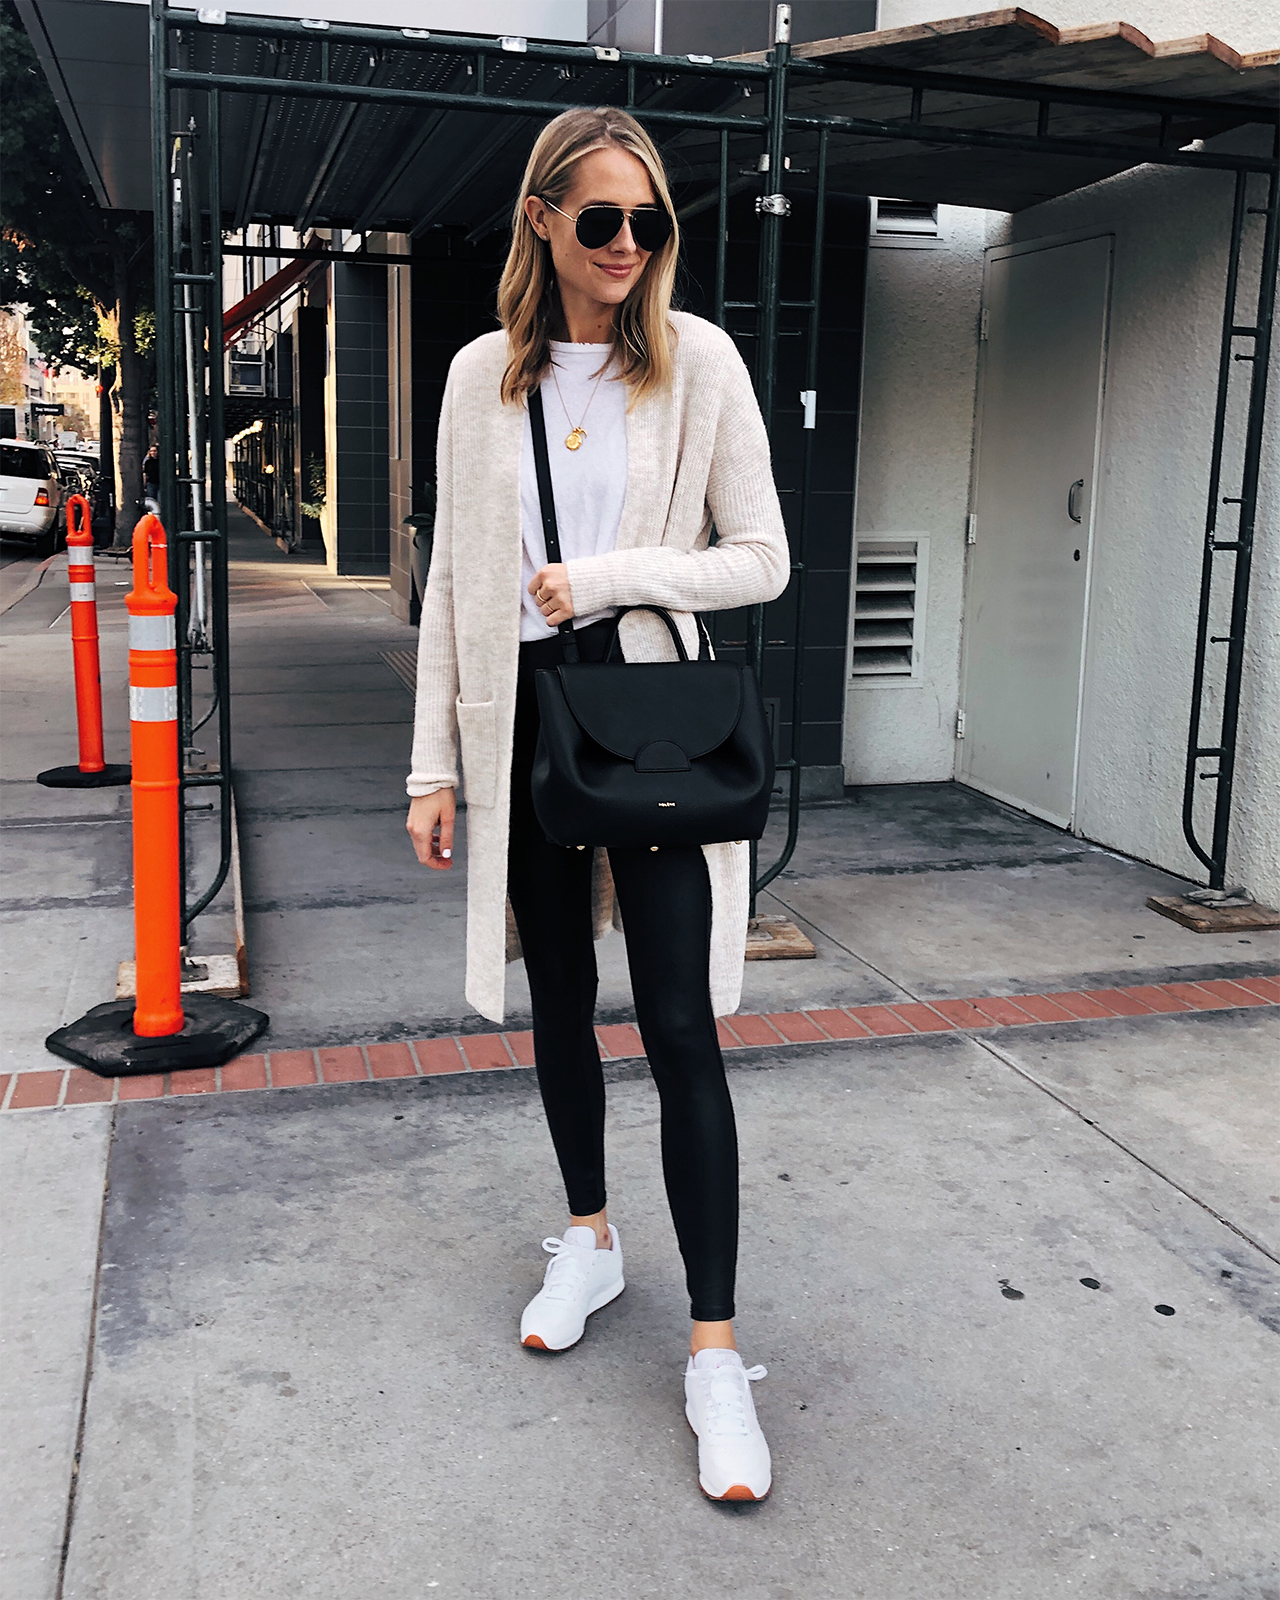 Fashion Jackson Wearing Beige Cardigan White Tshirt Black Leggings White Reebok Classic Sneakers Black Polene Handbag